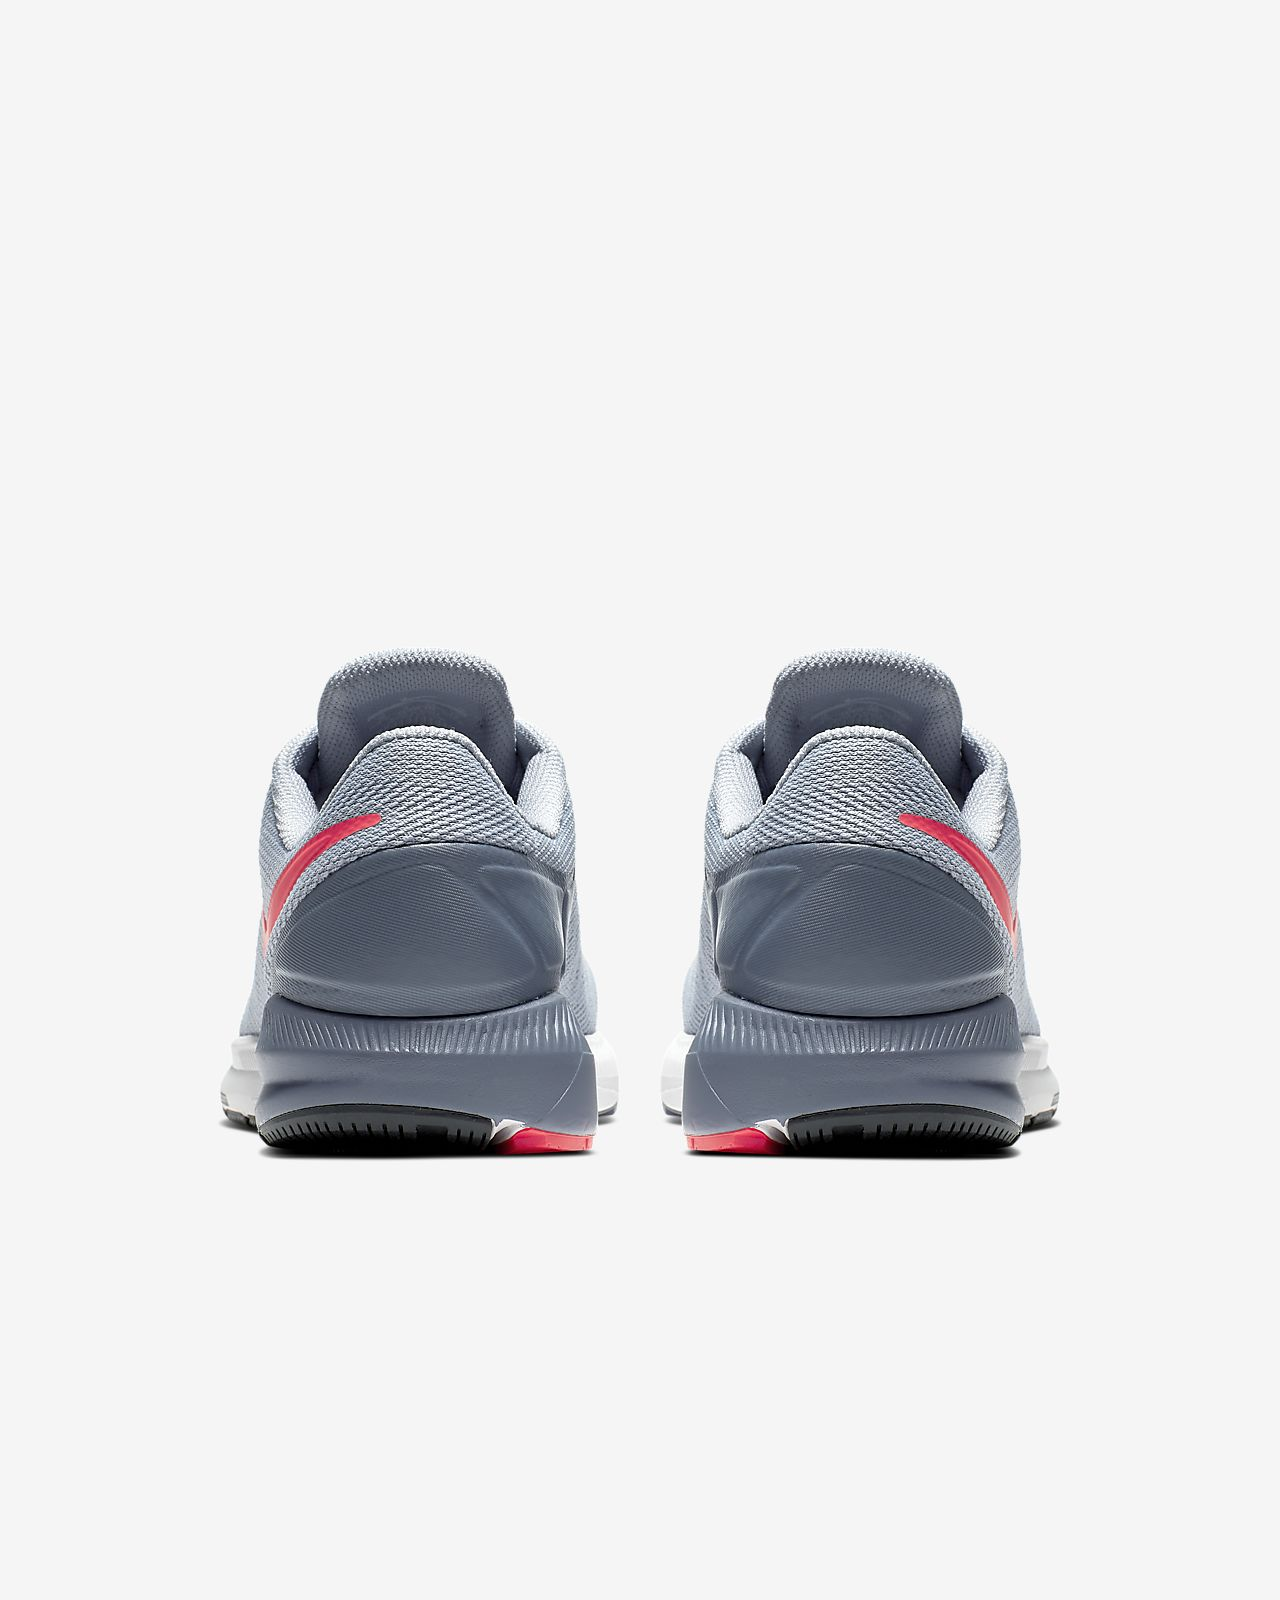 155436e8d5124 Nike Air Zoom Structure 22 Men s Running Shoe. Nike.com CA